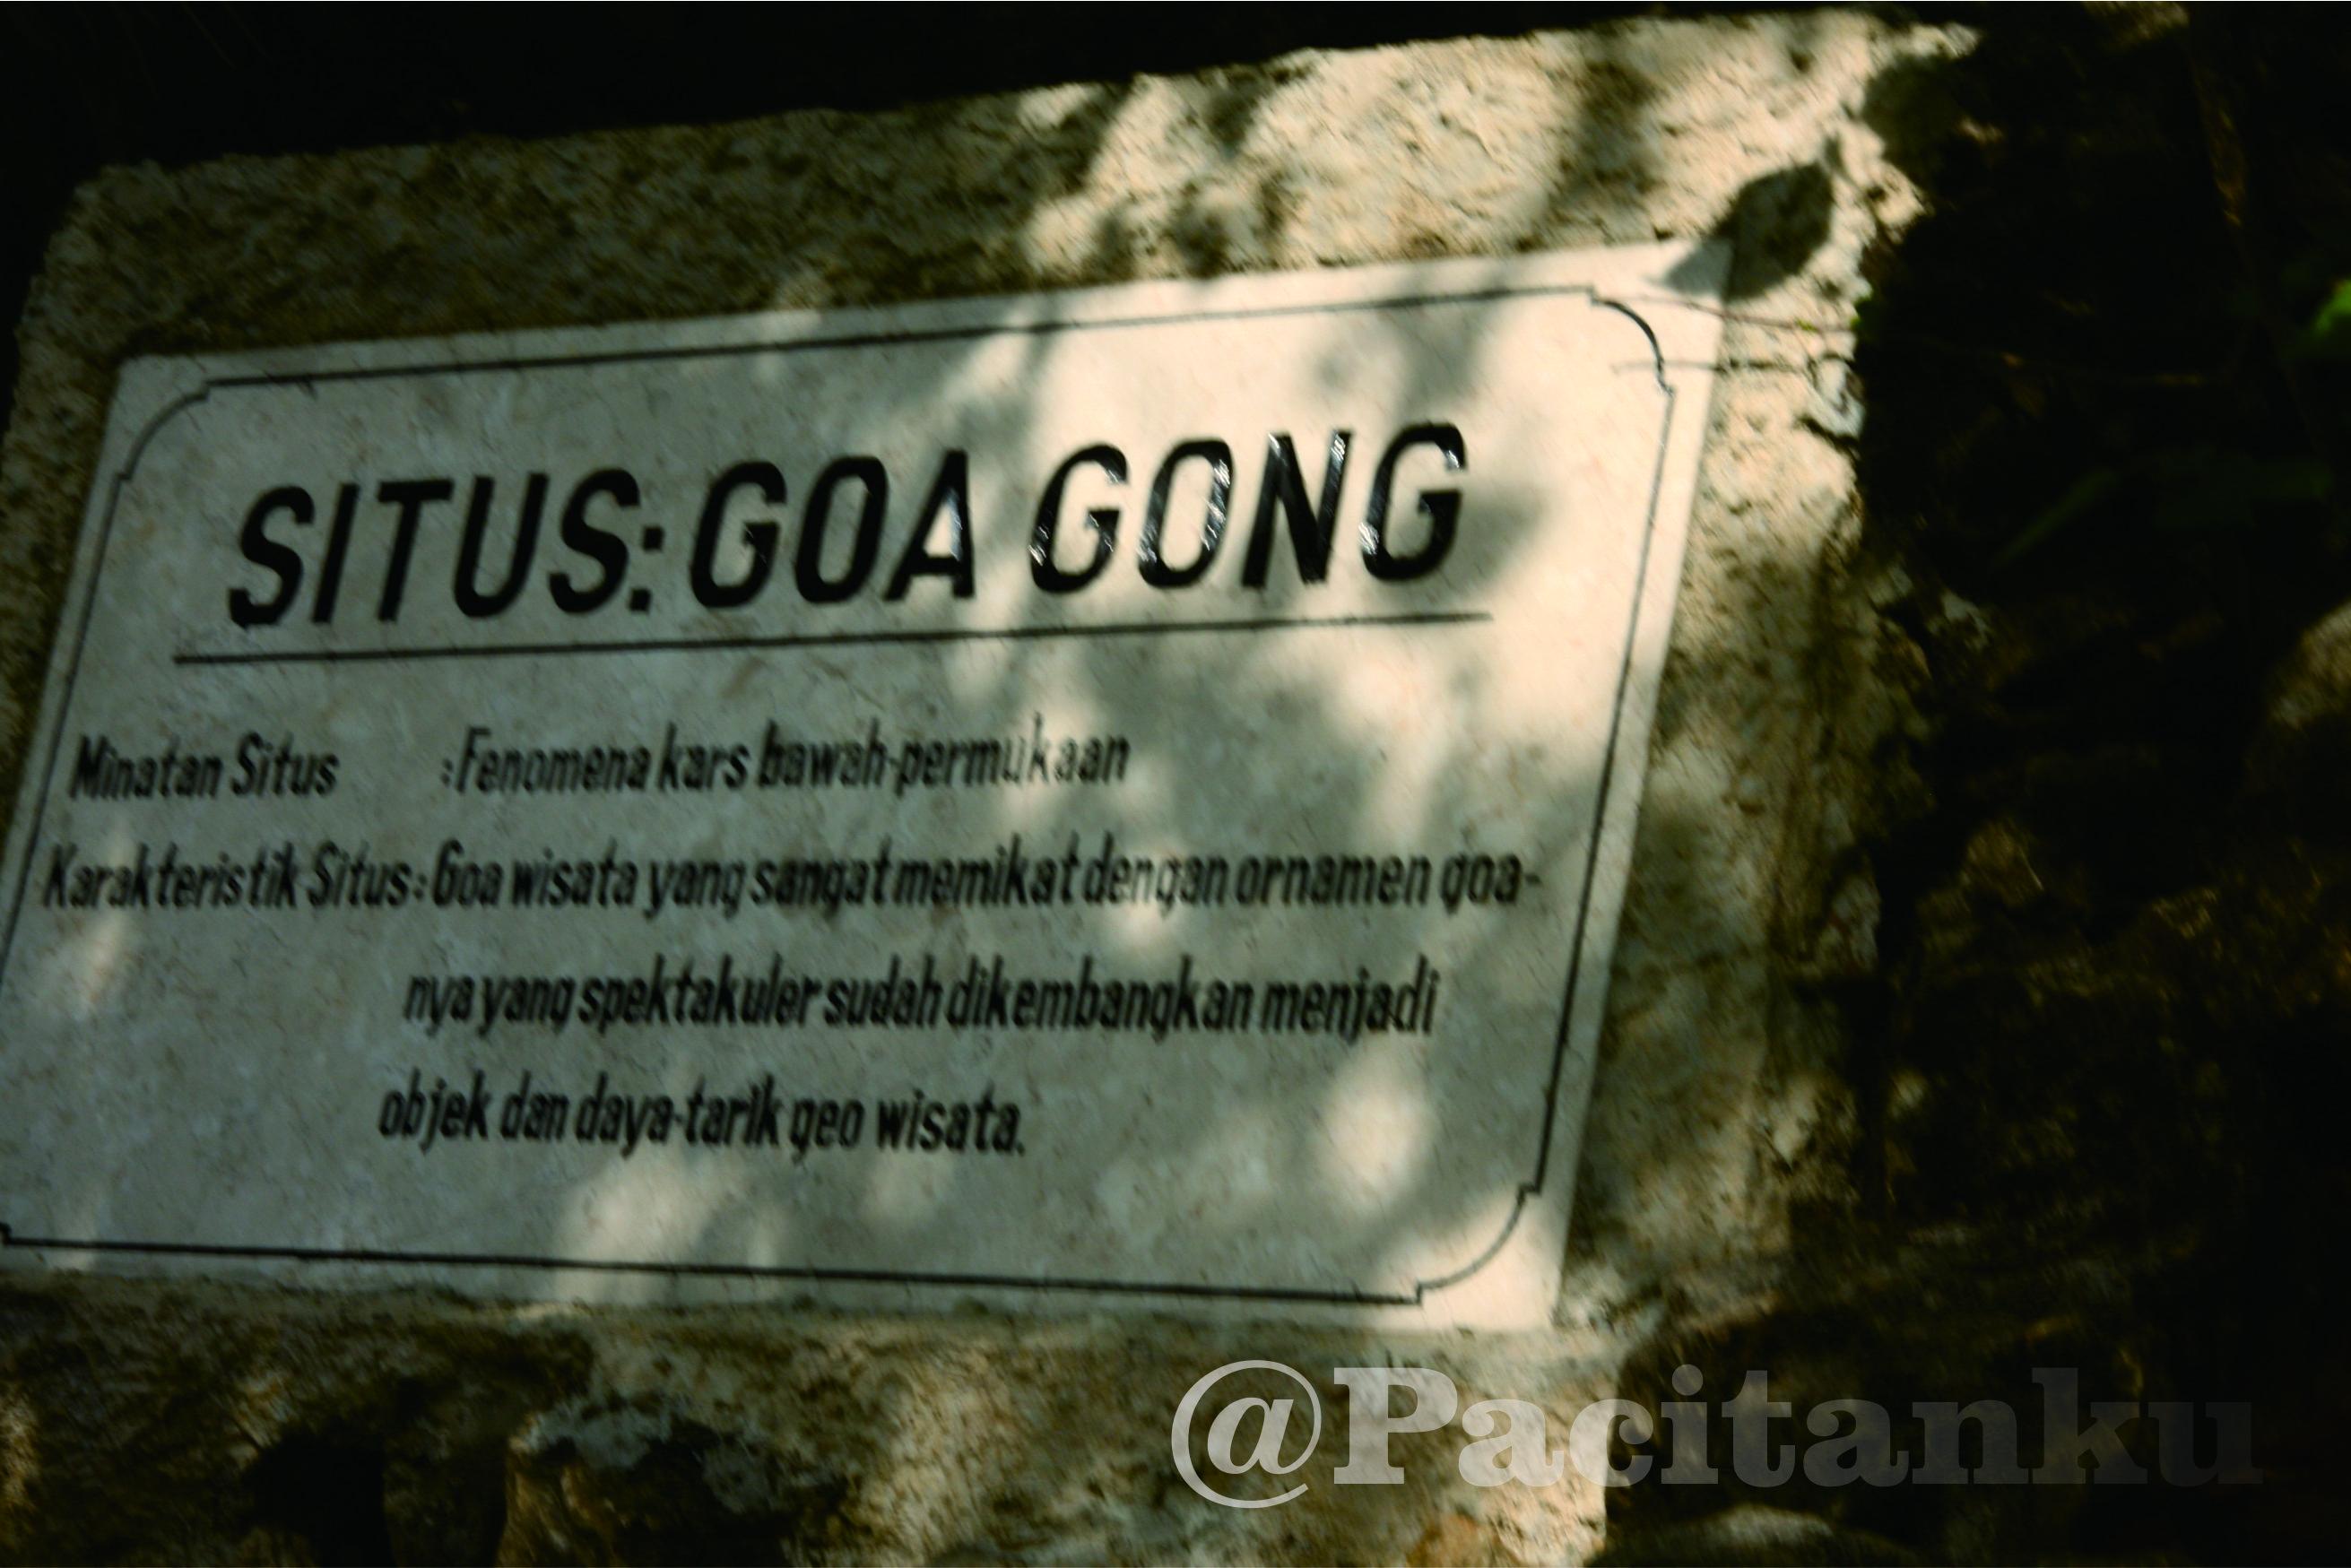 Pemkab Usahakan Kawasan Karst Pacitan Jadi Geopark Dunia Goa Gong